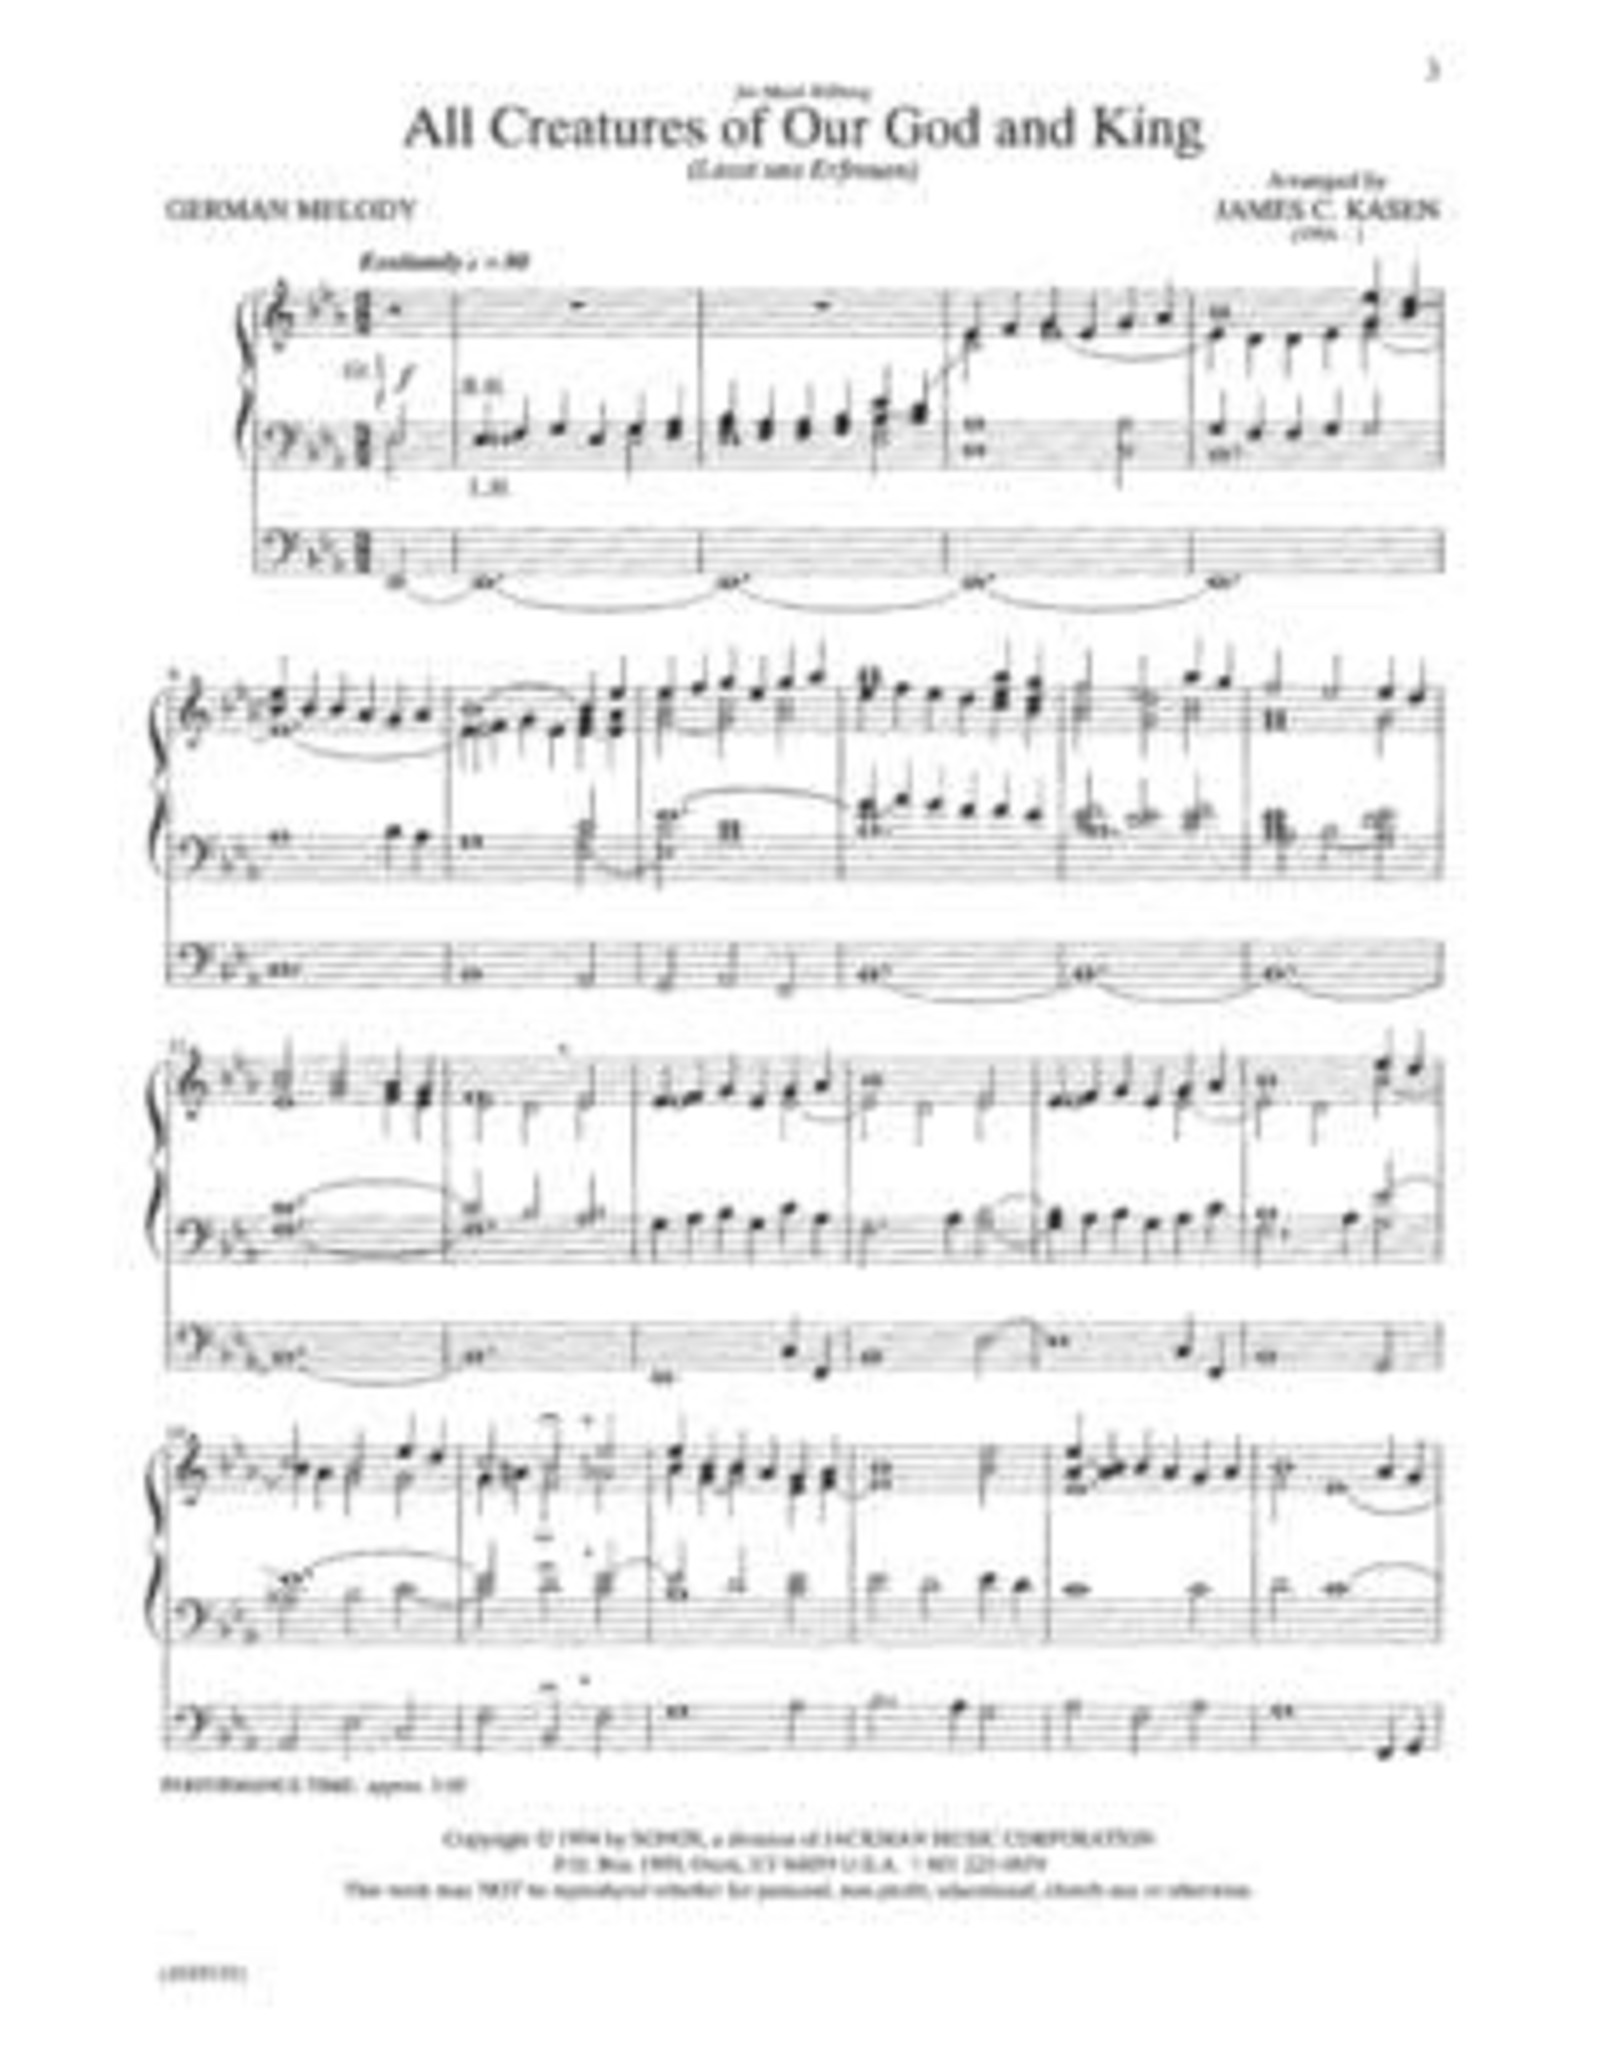 Jackman Music Organ Postludes for Church Services Vol. 1 arr. James C. Kasen